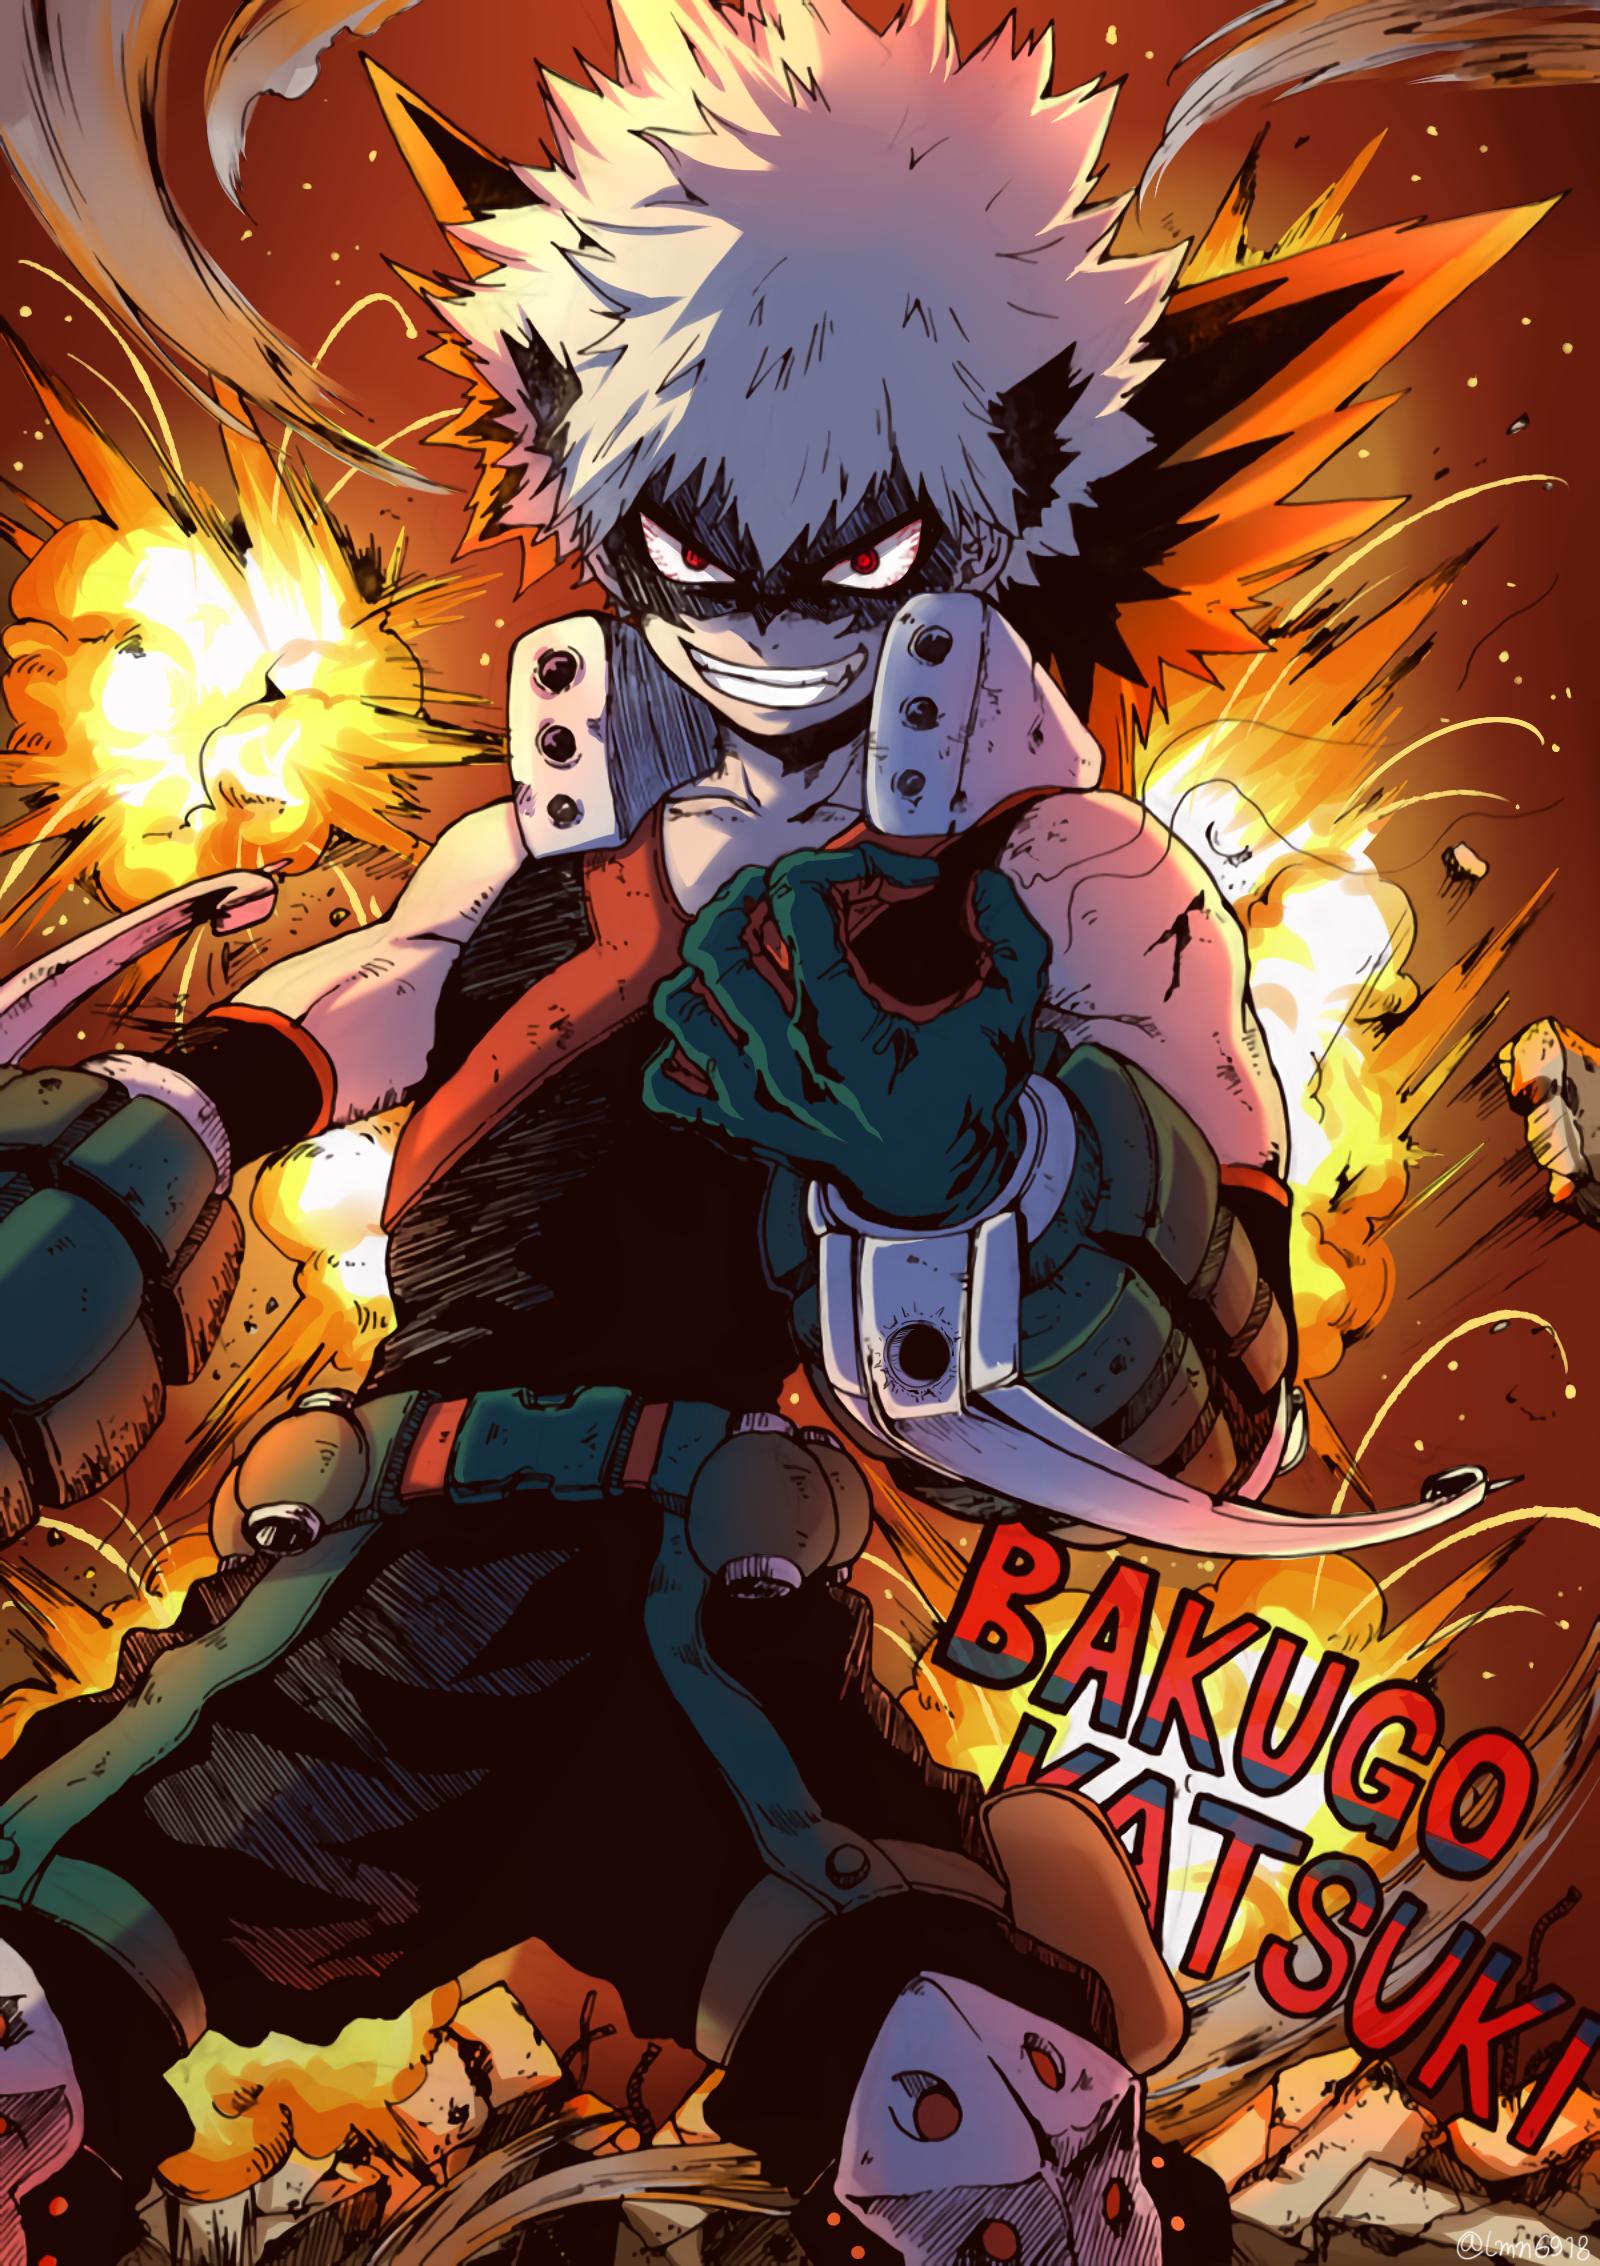 Image by Chris Owens on Bakugo Hero academia characters